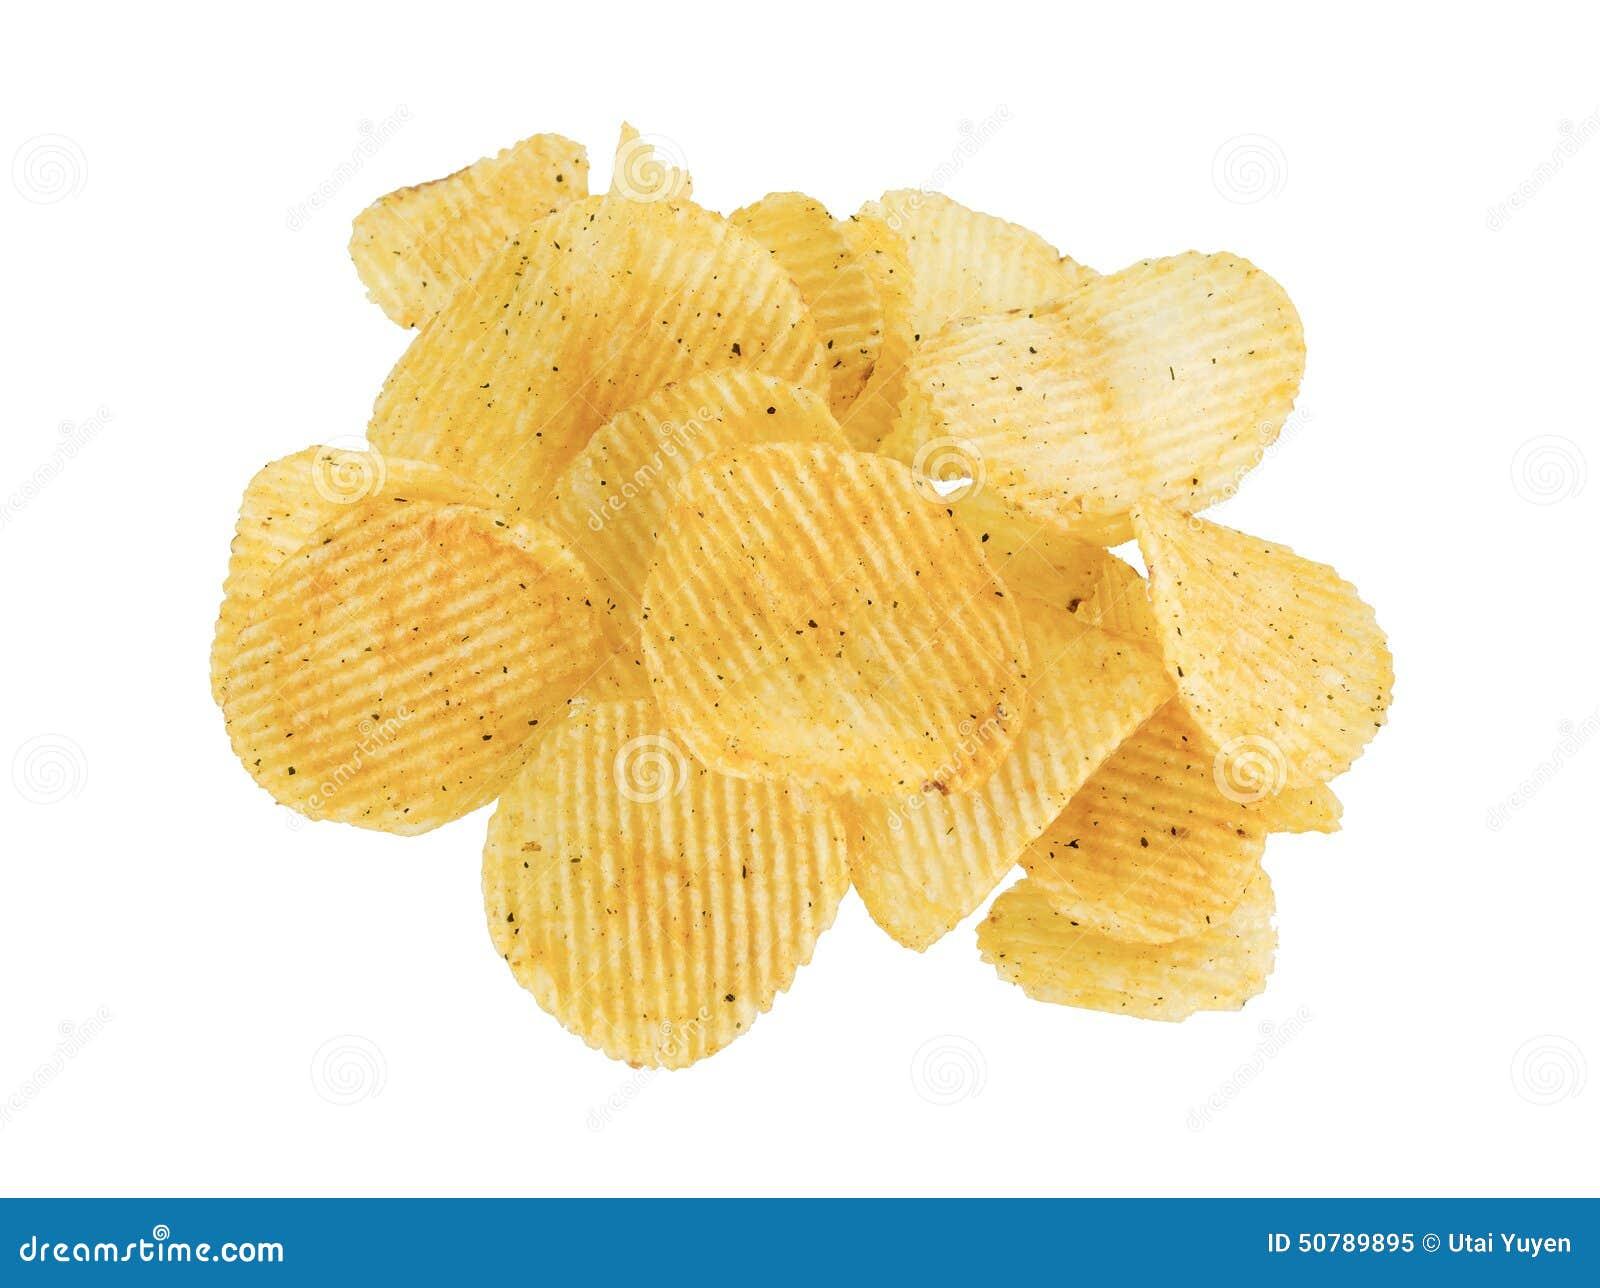 Potato Chips Lobster Taste Stock Image | CartoonDealer.com #60485323